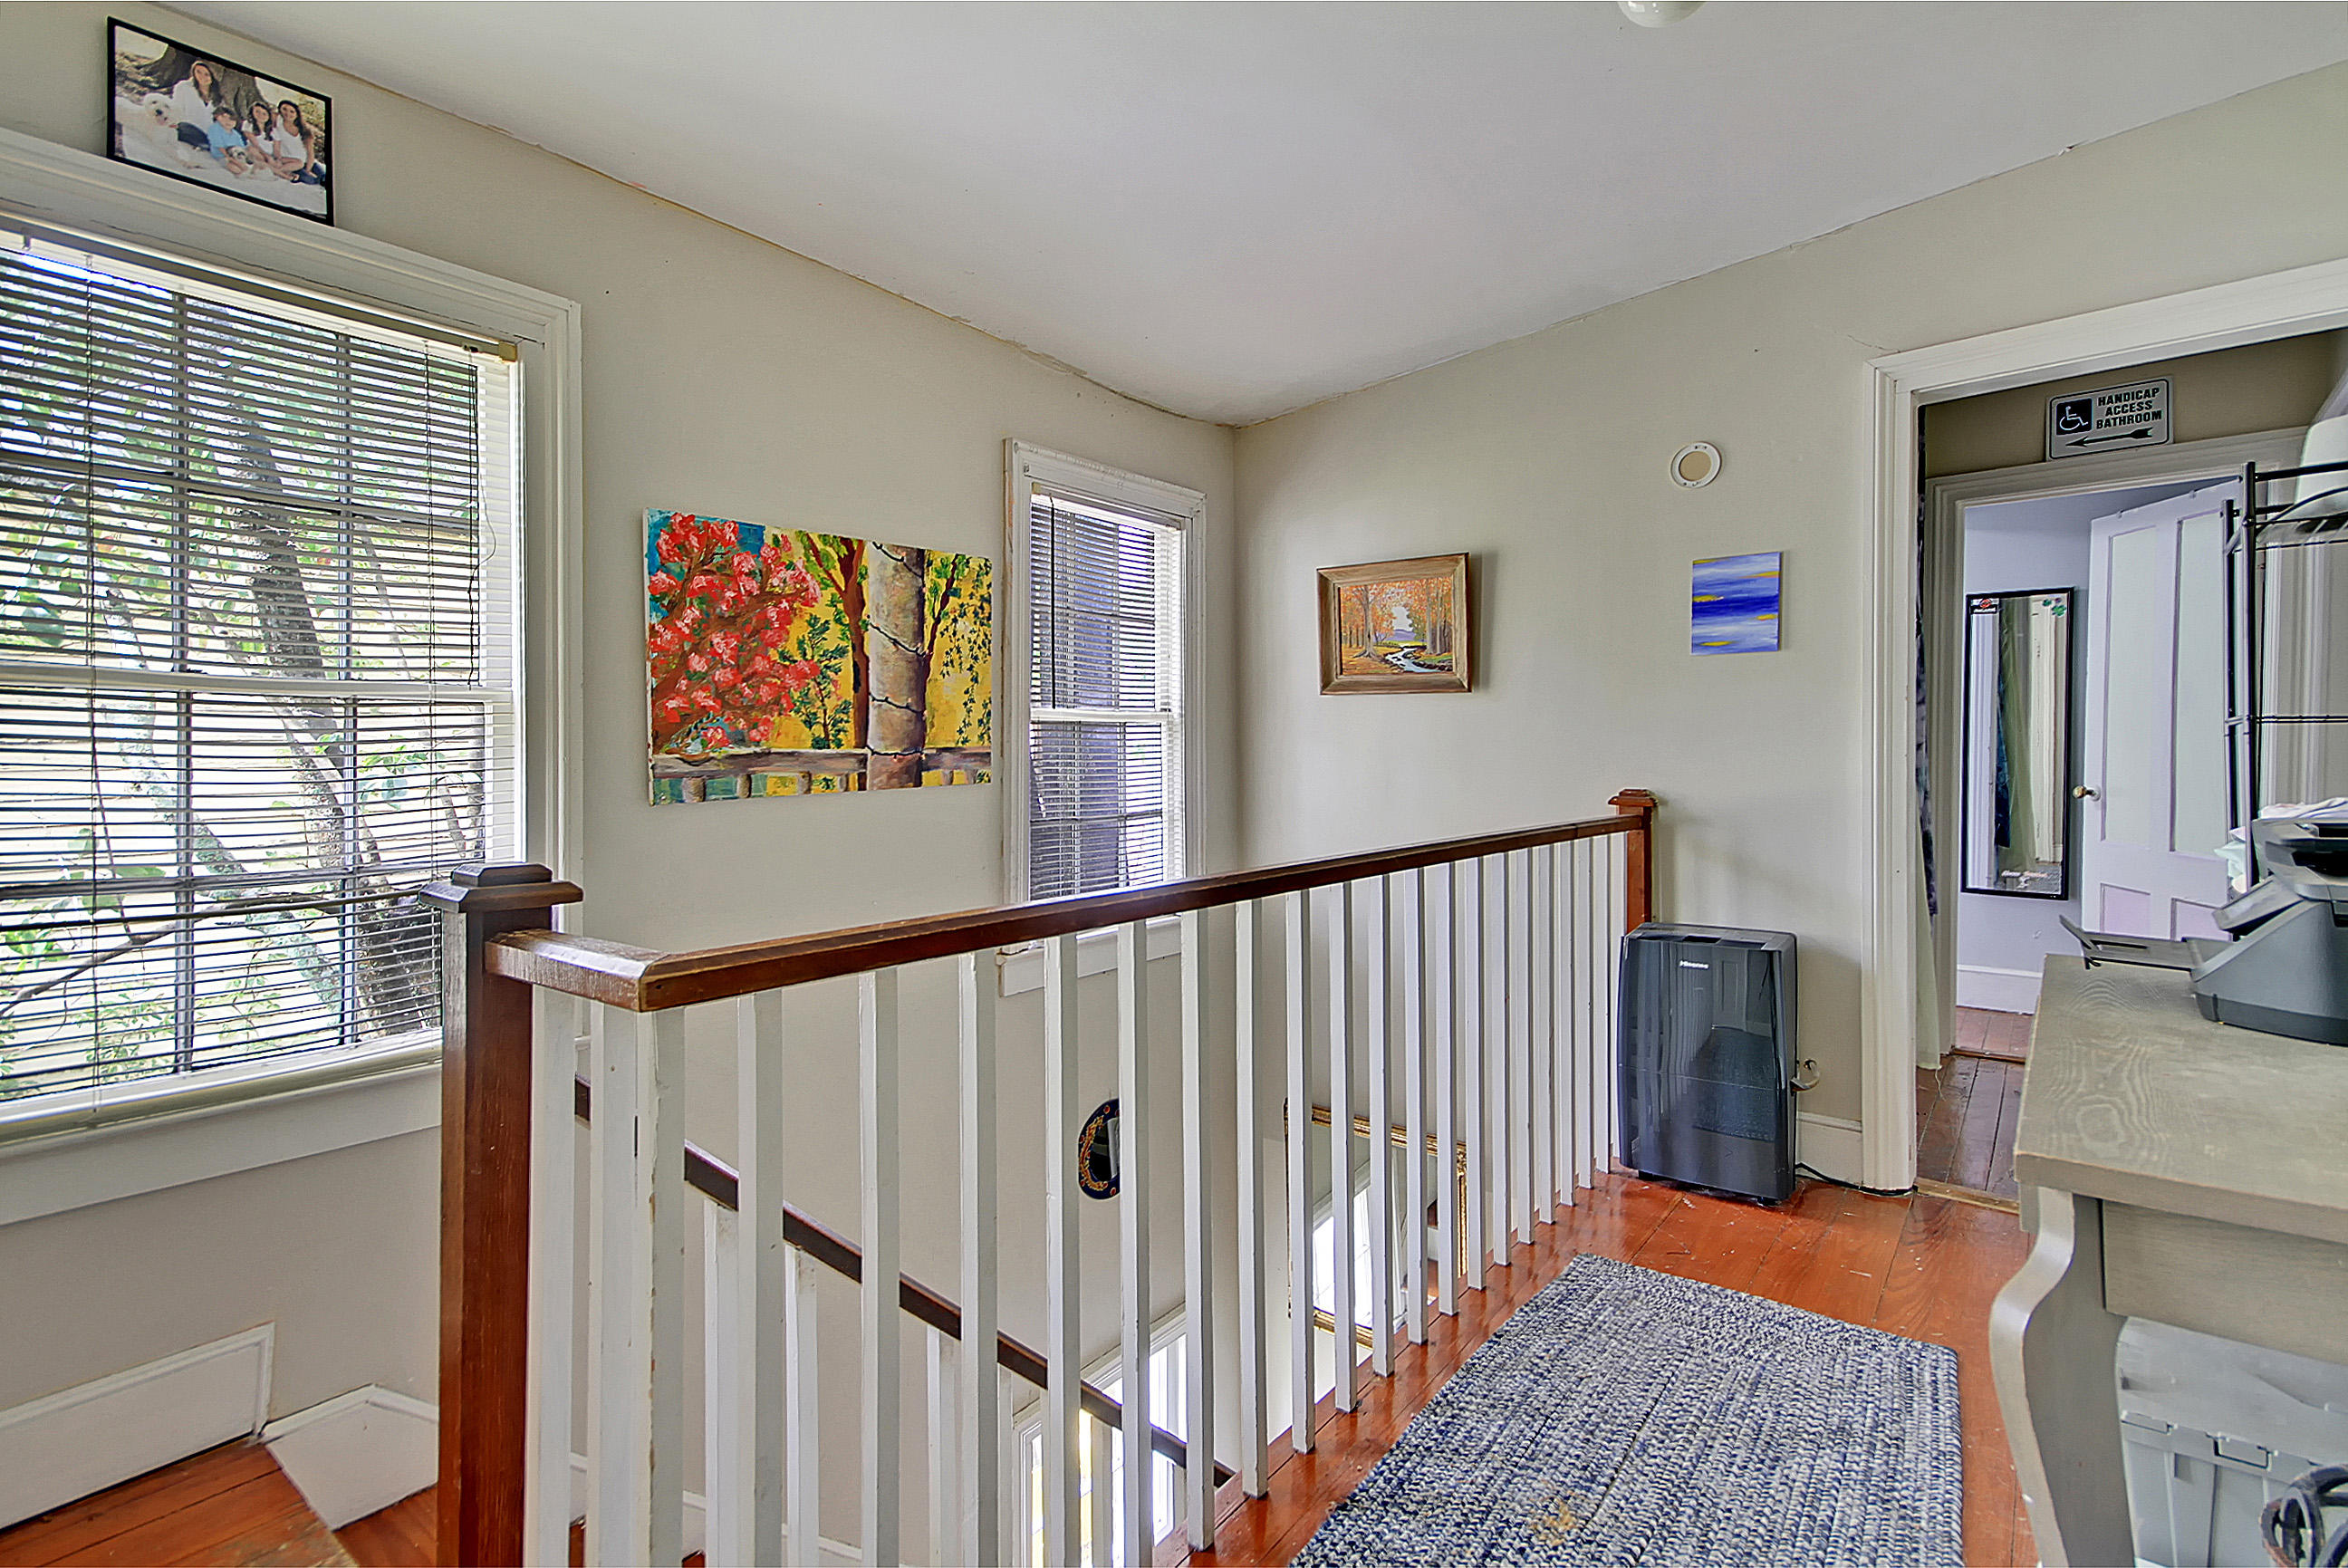 Radcliffeborough Homes For Sale - 70 Vanderhorst, Charleston, SC - 4